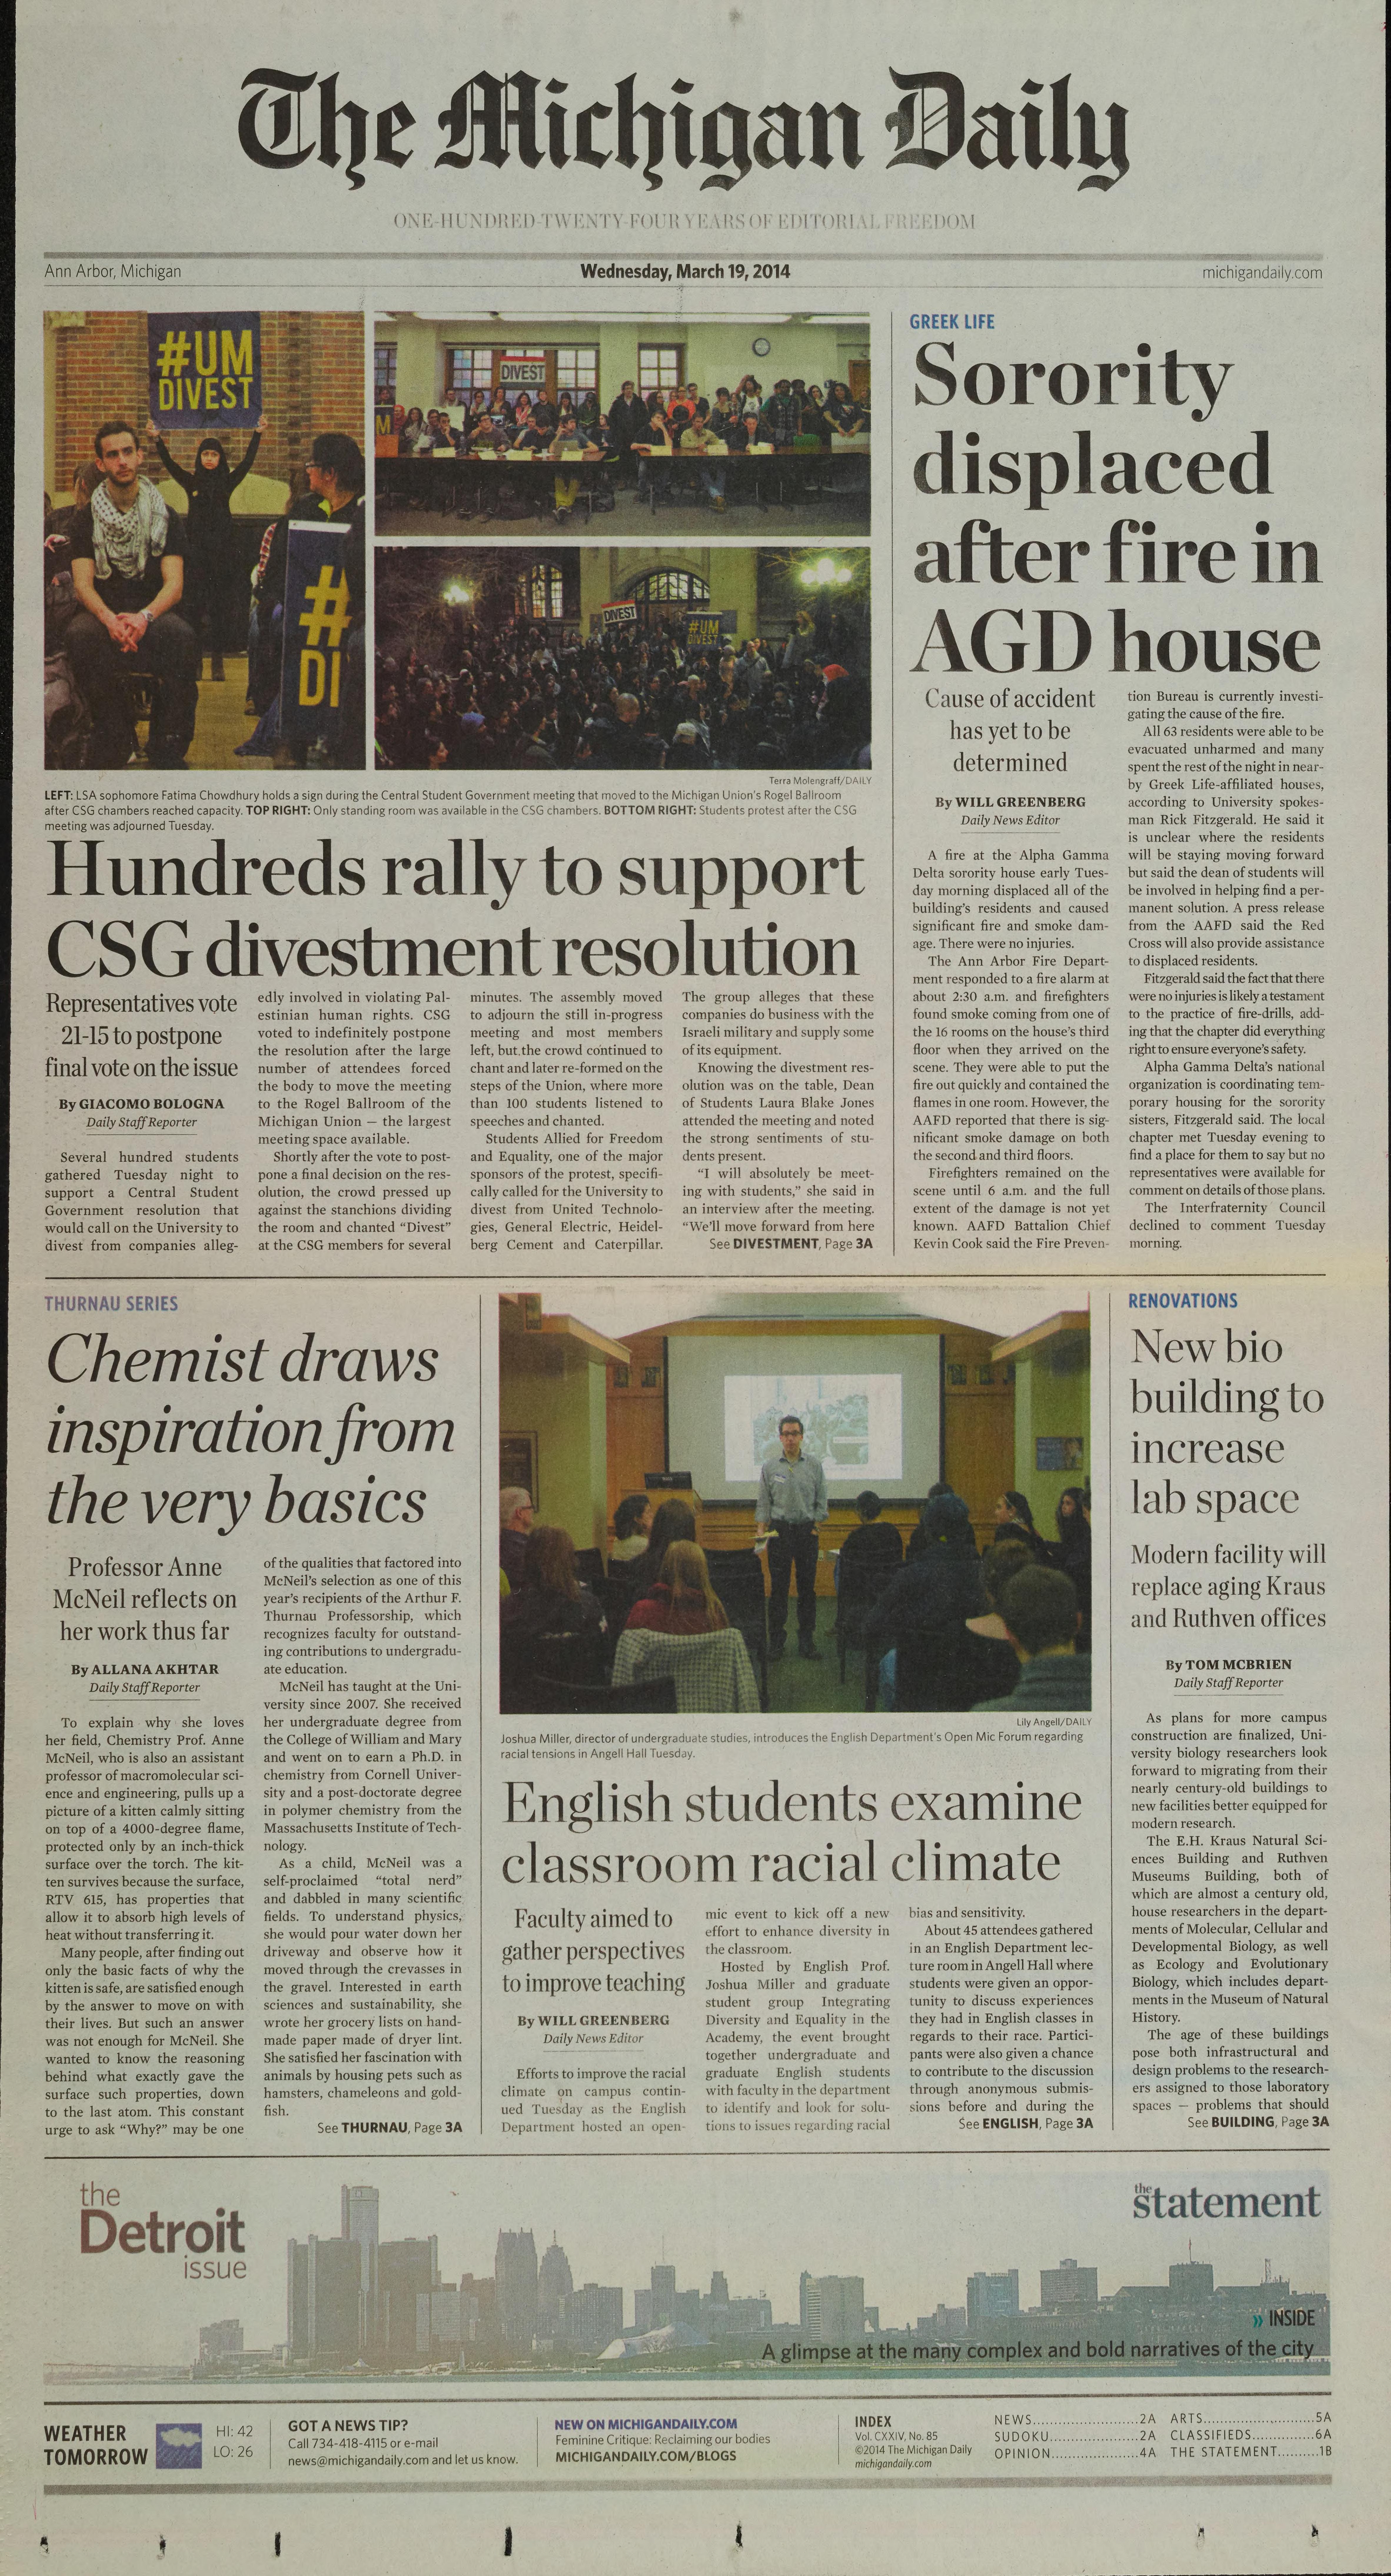 Michigan Daily Digital Archives - March 19, 2014 (vol  124